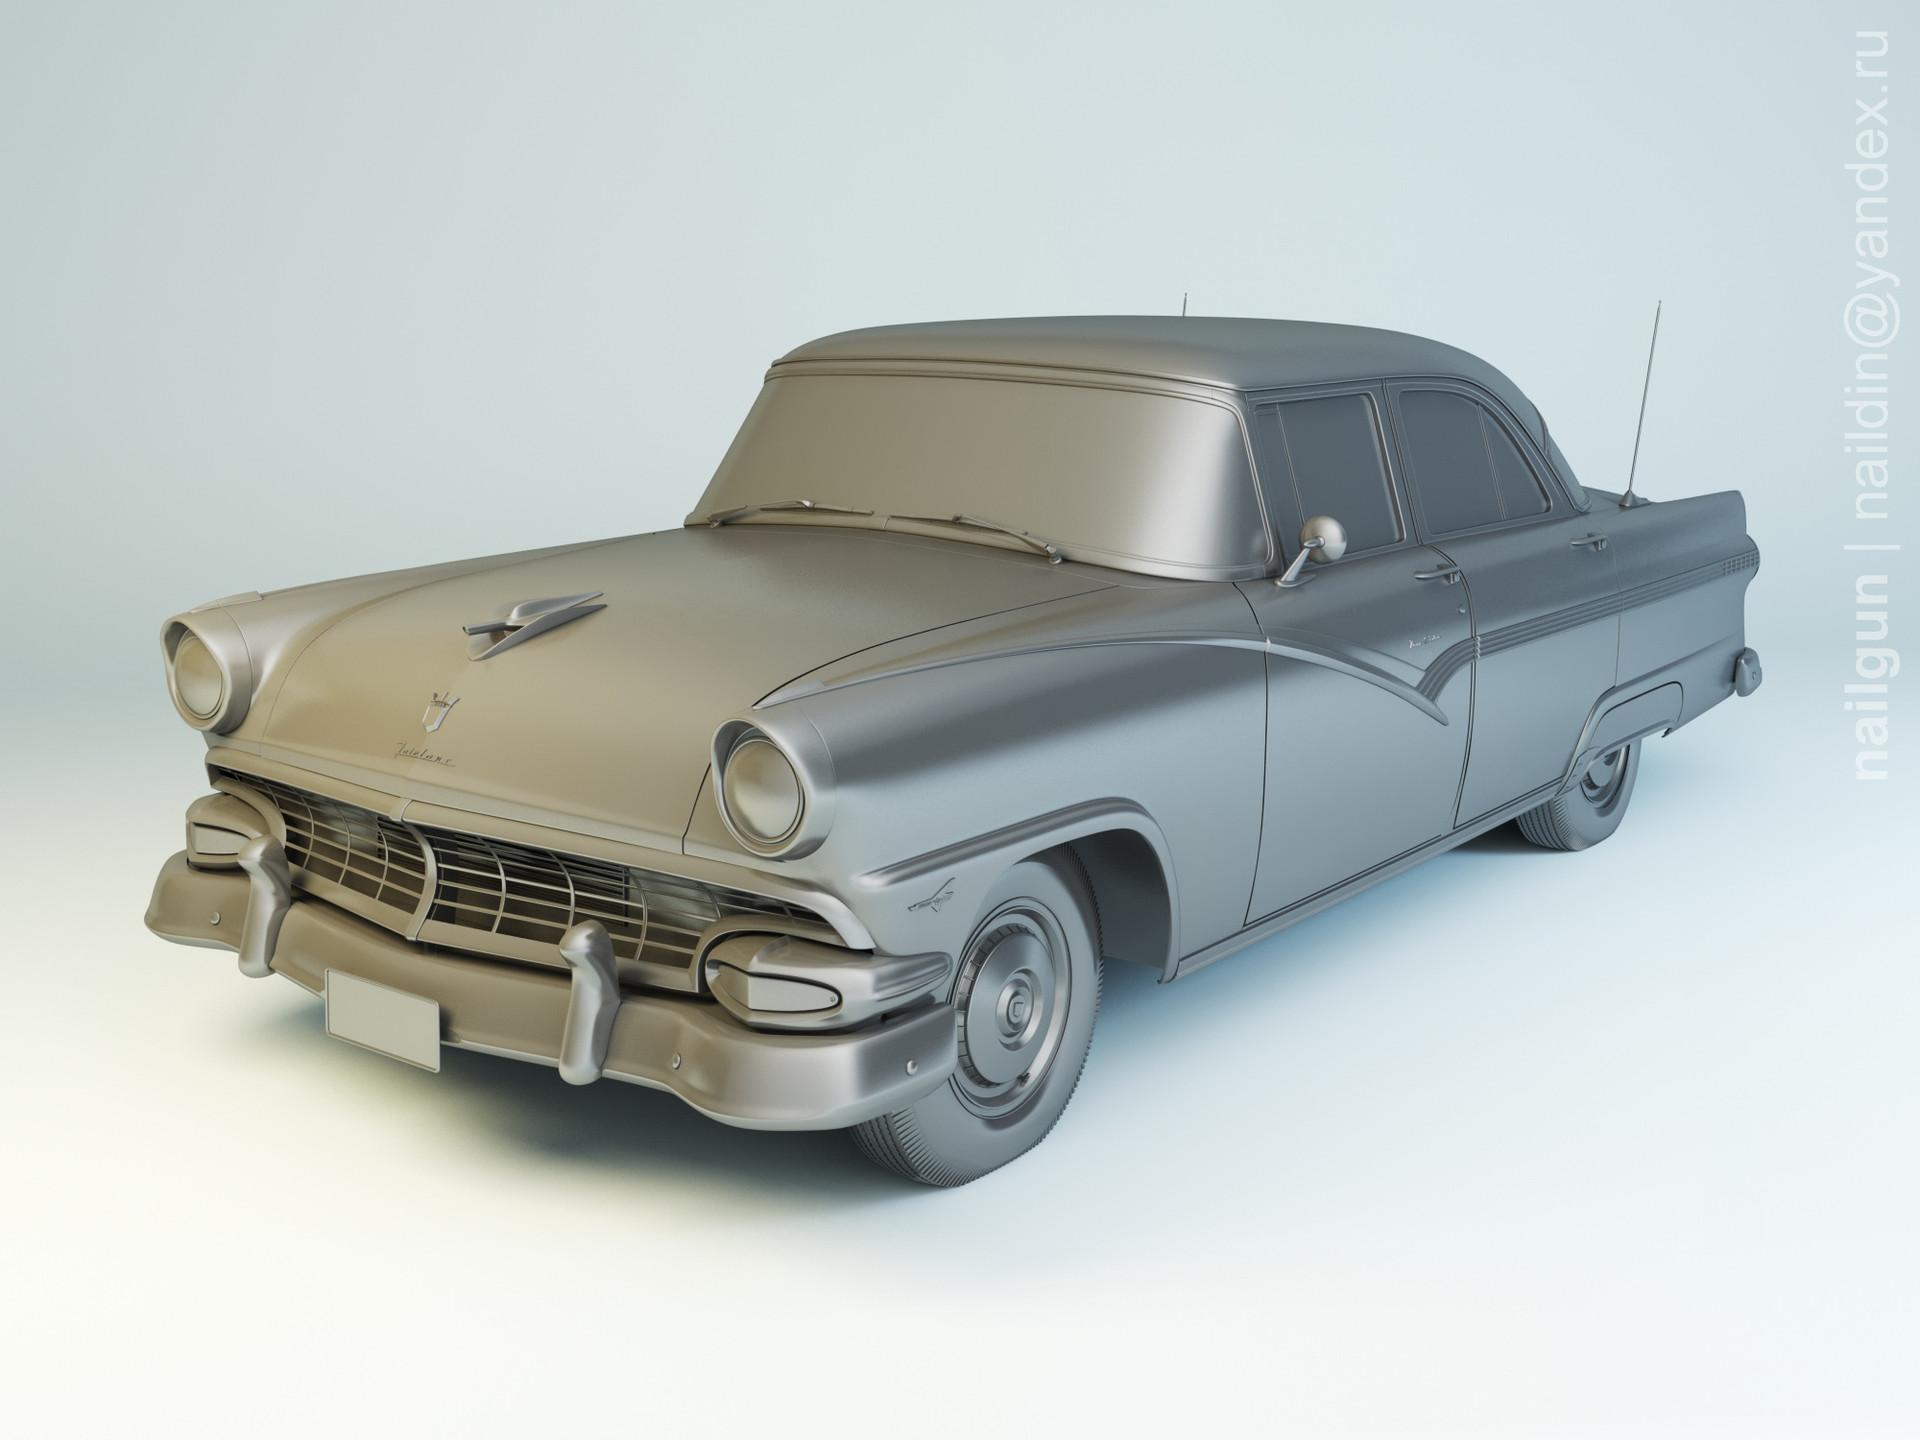 Nail khusnutdinov pwc 001 010 ford fairlane 1956 modelling 0